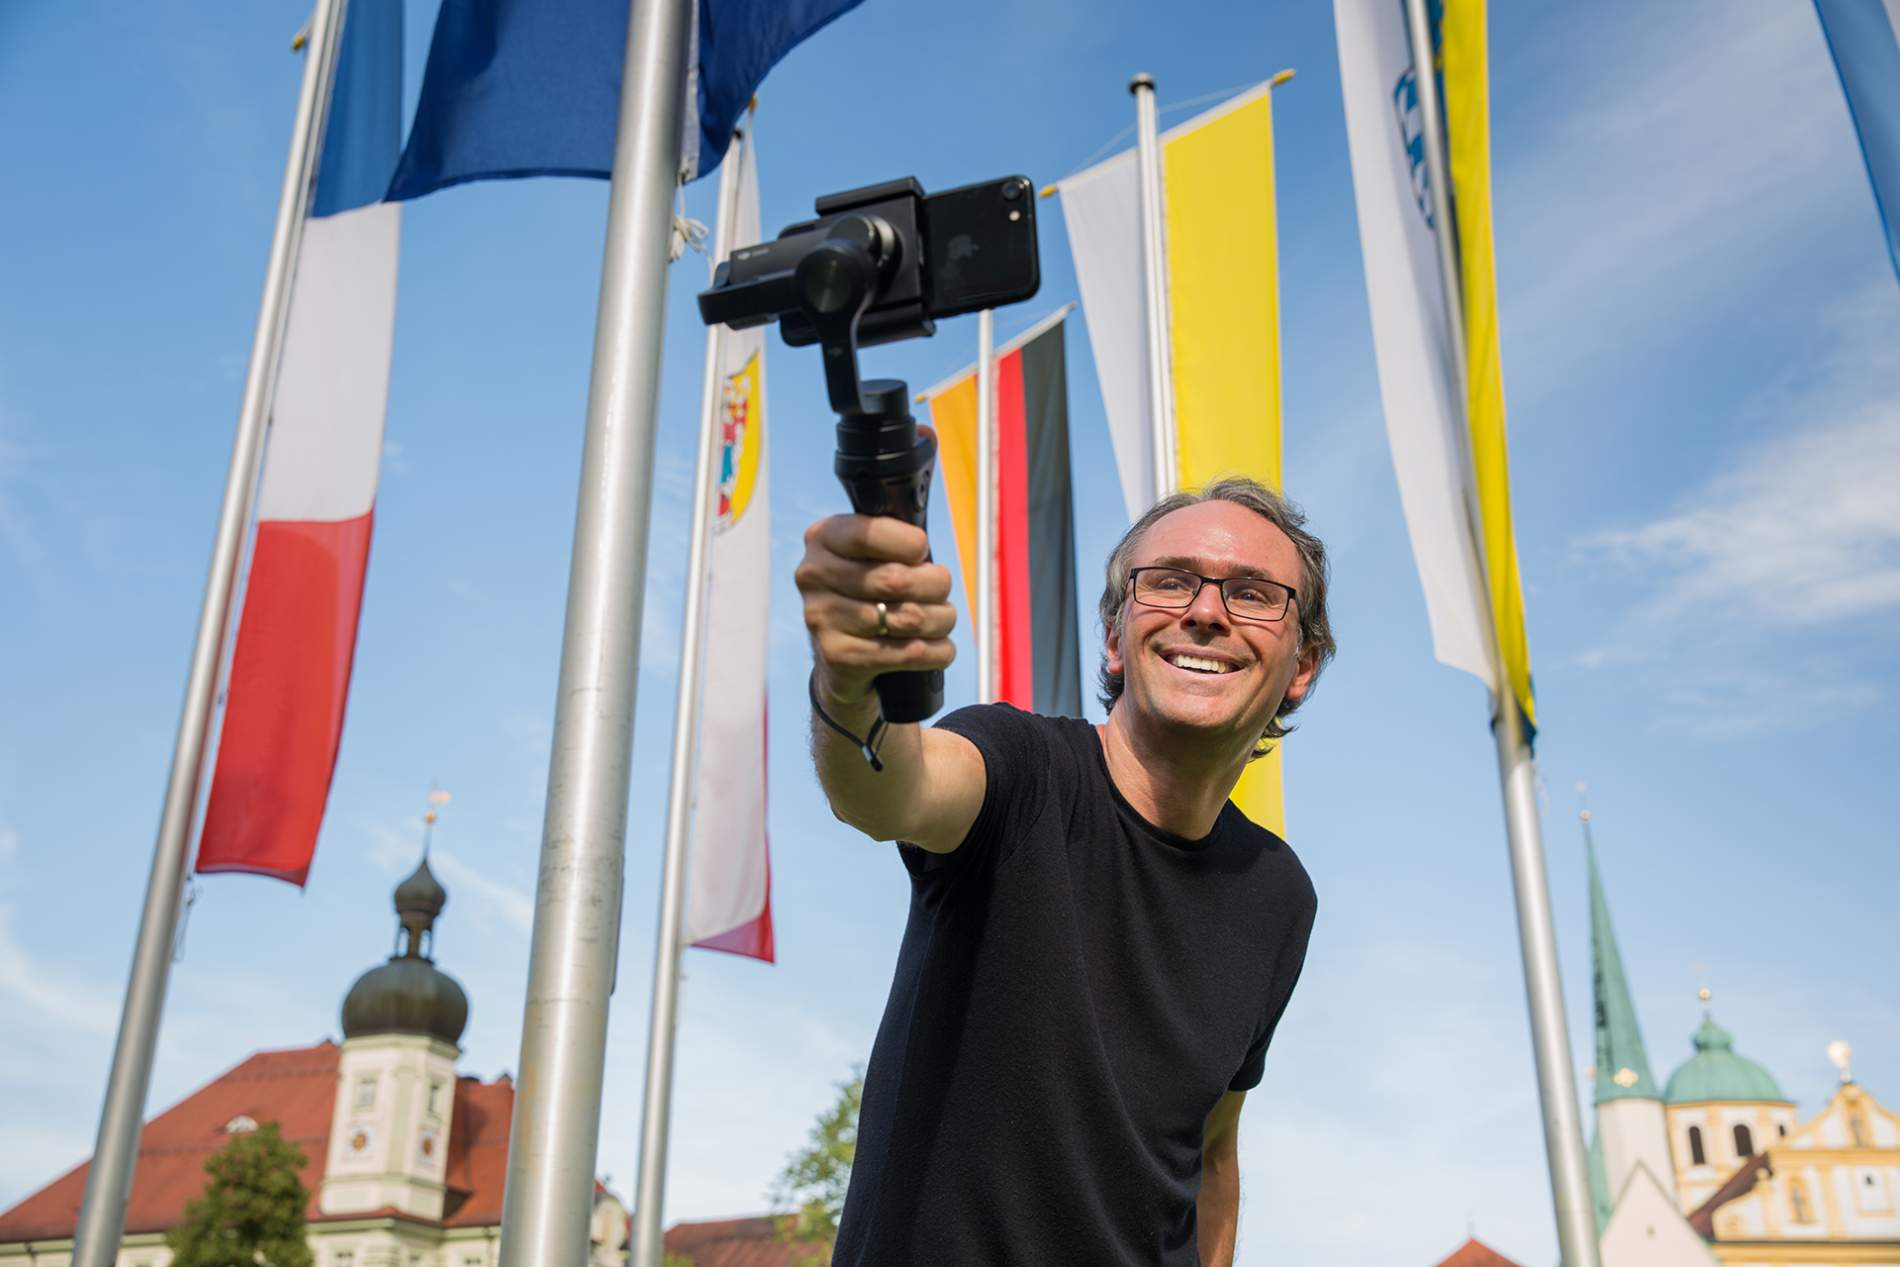 Günter Exel (Tourismuszukunft): Livereportagen